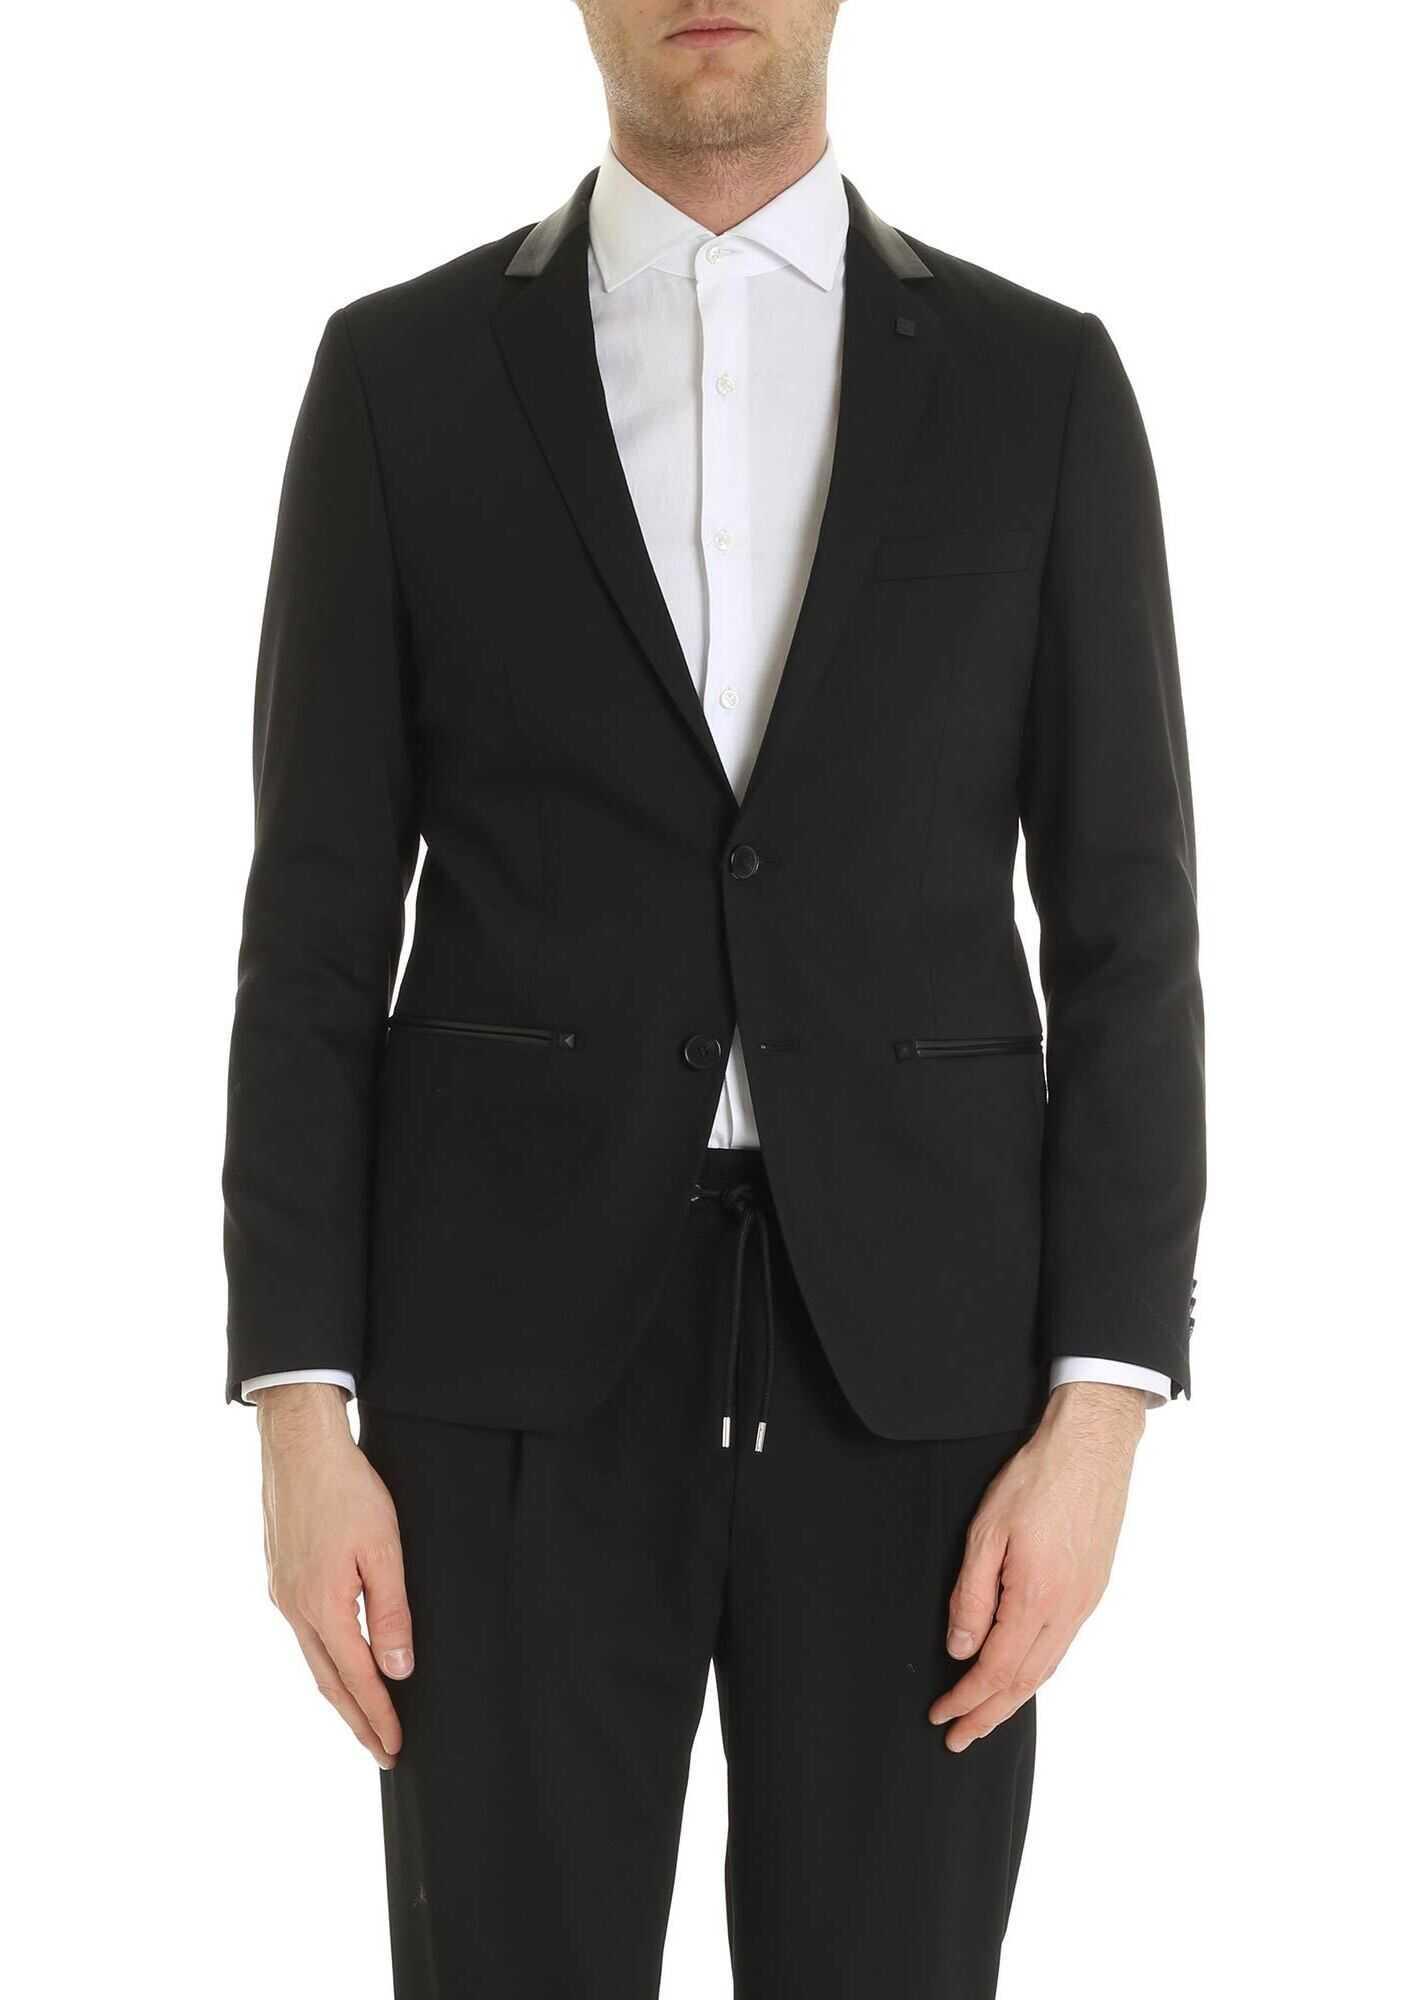 Karl Lagerfeld Dark Black Jacket With Leather Insert Black imagine